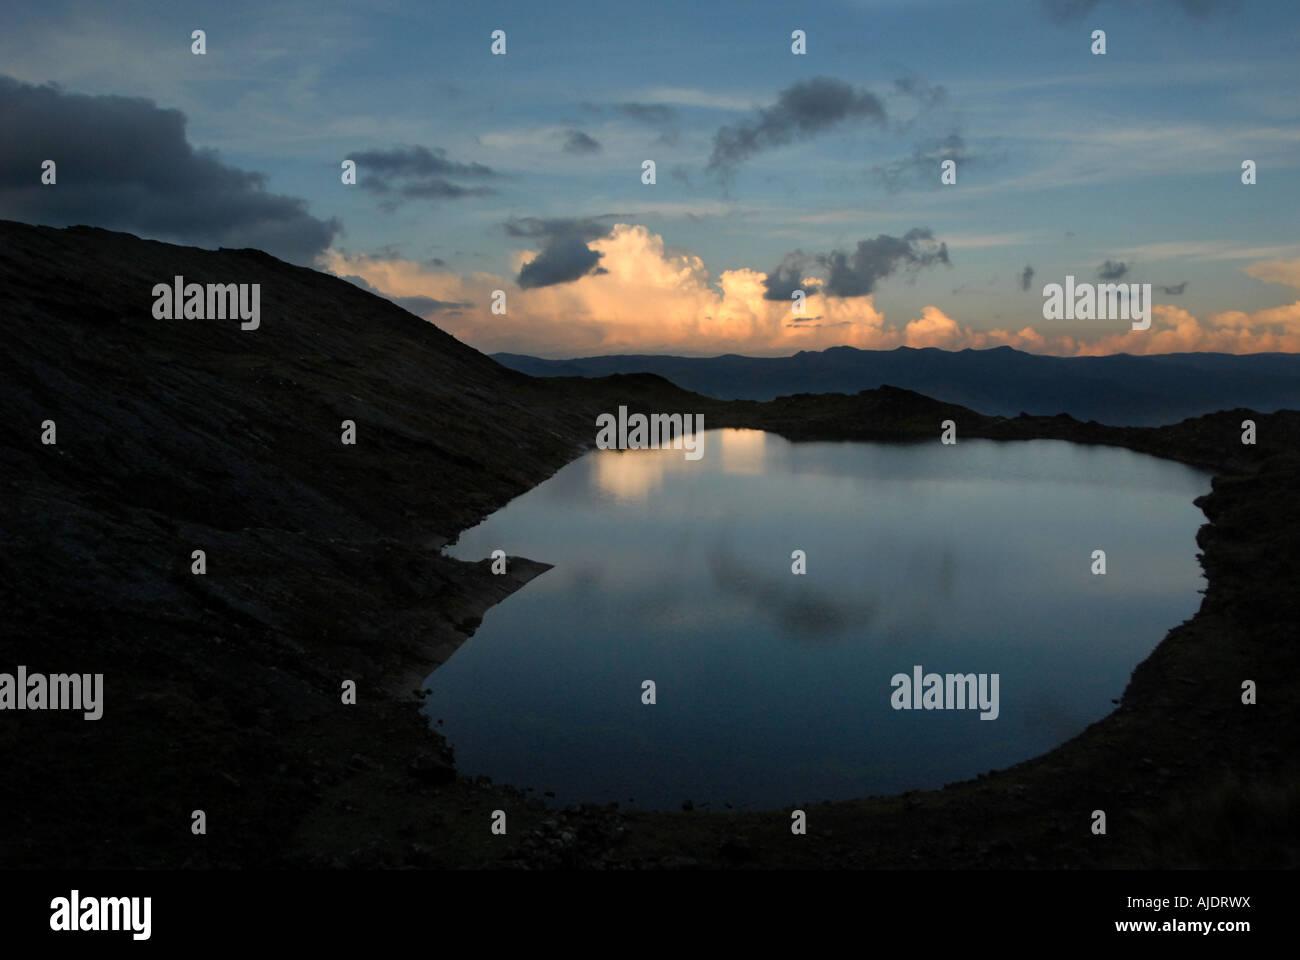 Sunrise is reflected off of Lake Chillata located below Mt Illampu near Sorata, Bolivia, South America. - Stock Image